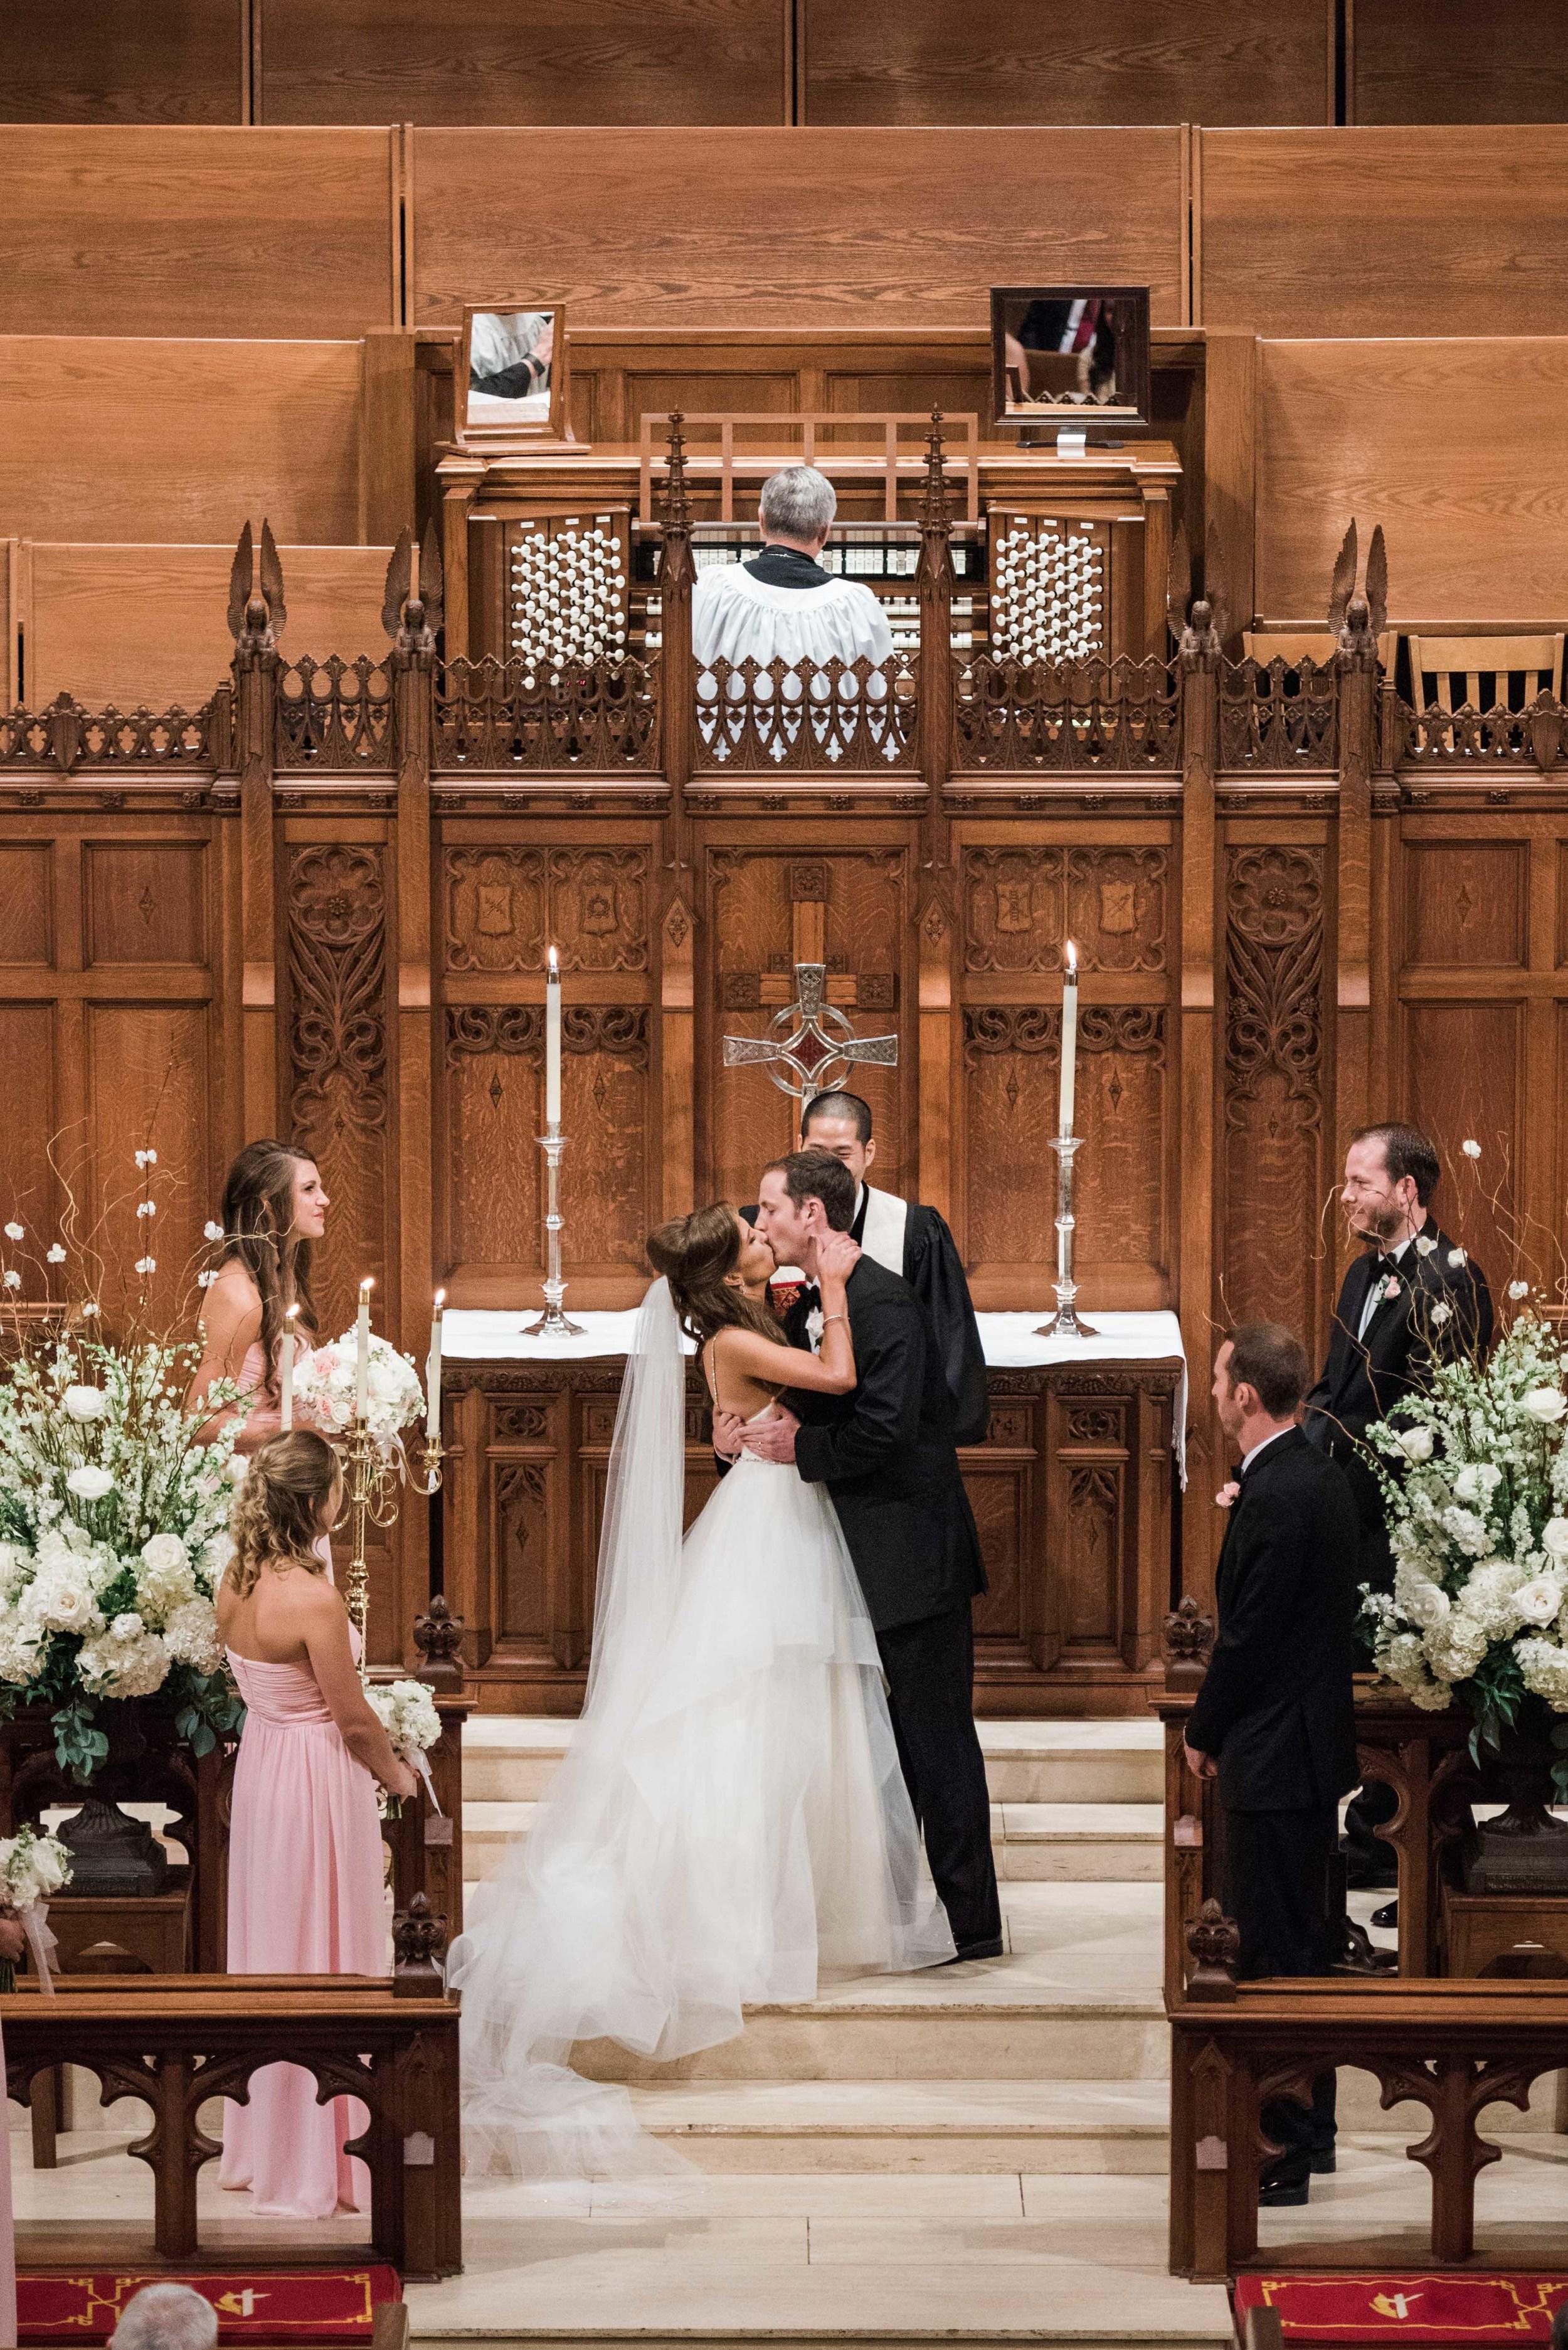 Dana-Fernandez-Photography-Weddings-in-Houston-Magazine-feature-Houston-wedding-photographer-film-34.jpg